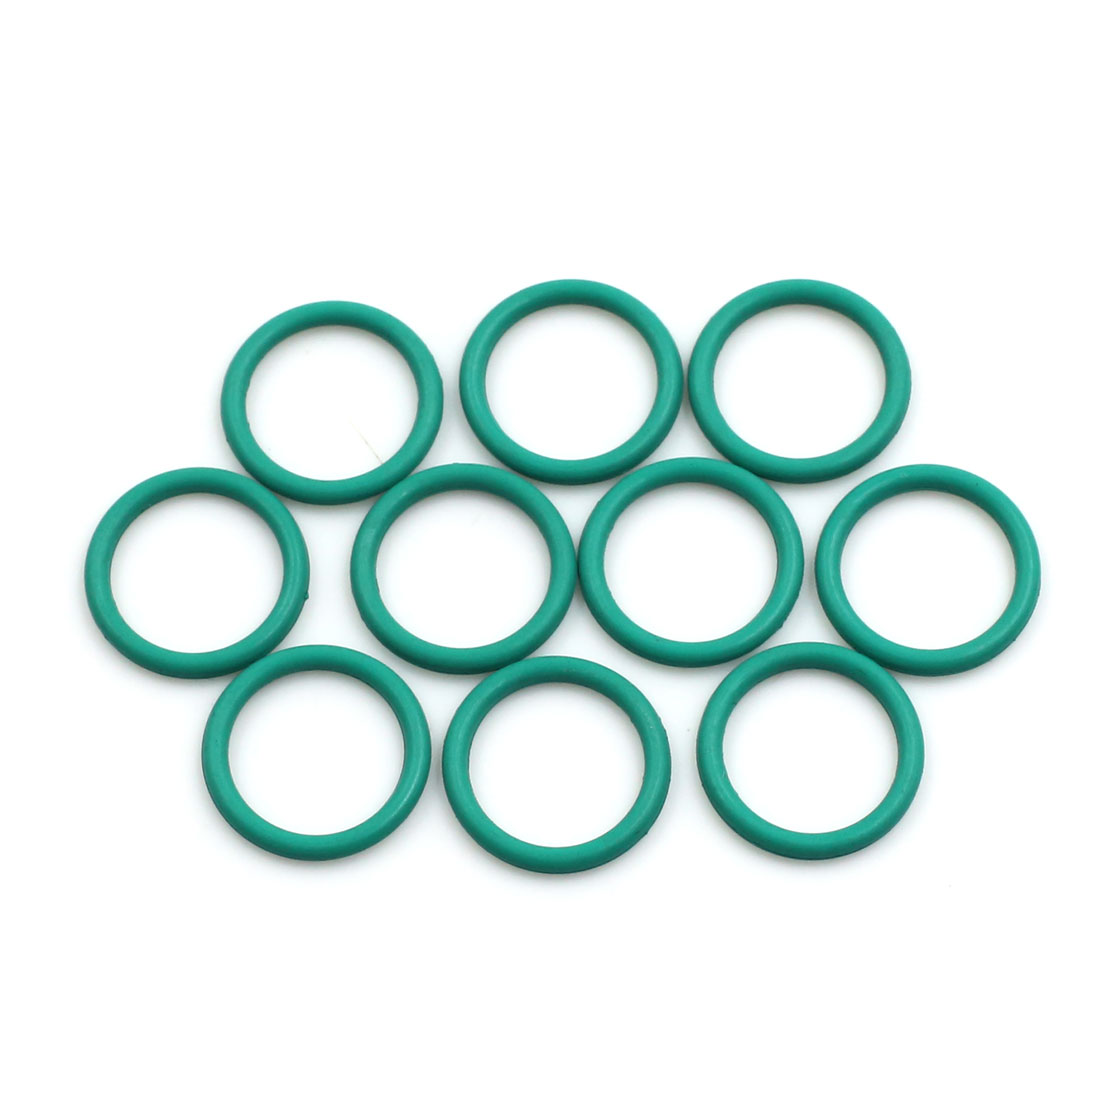 10pcs Green Universal FKM O-Ring Sealing Gasket Washer for Car 18mm x 2mm